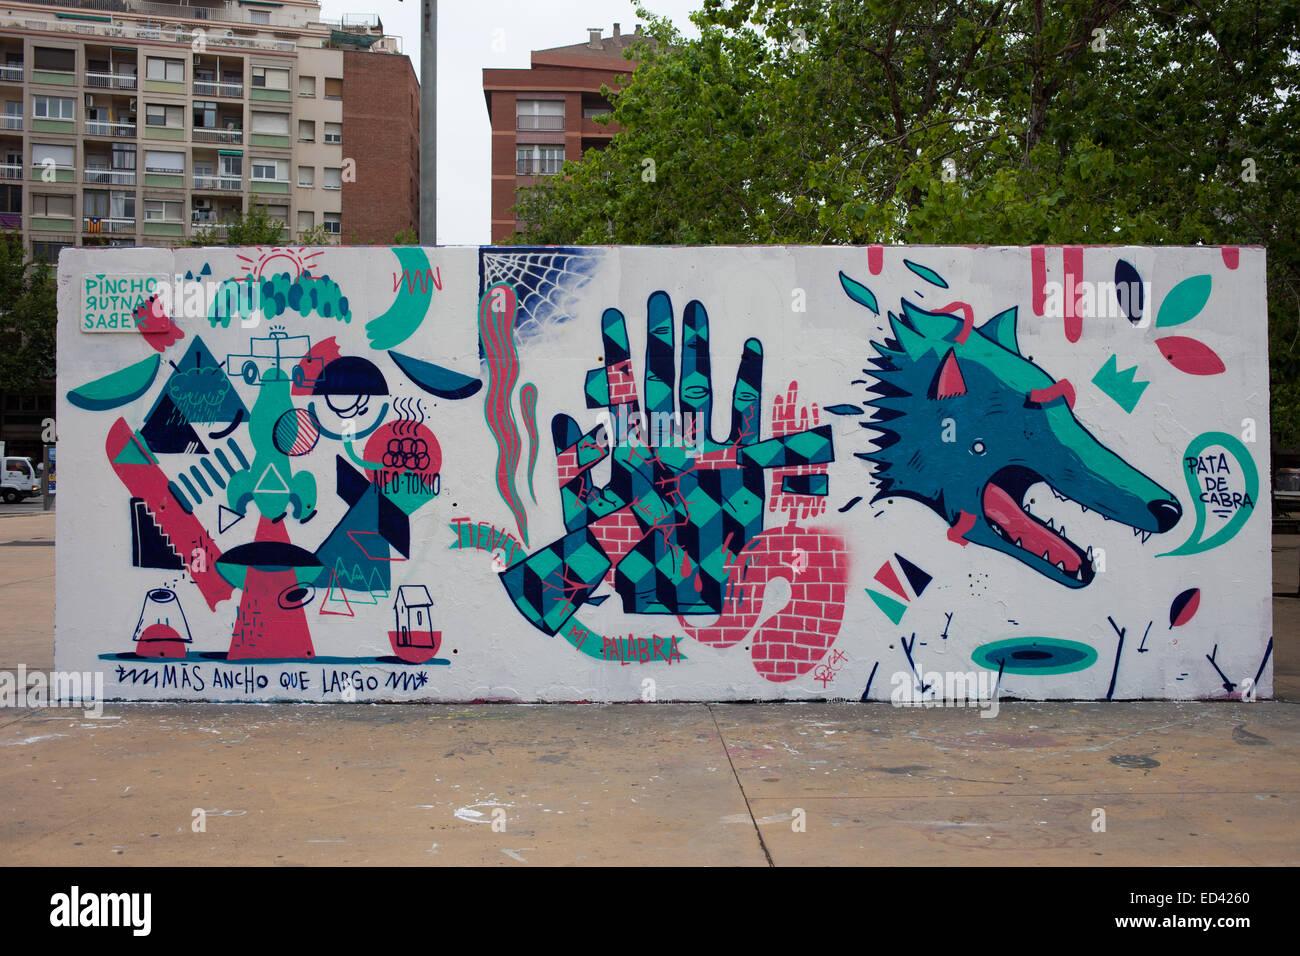 Street art in Barcelona Catalonia Spain Mural on a concrete wall